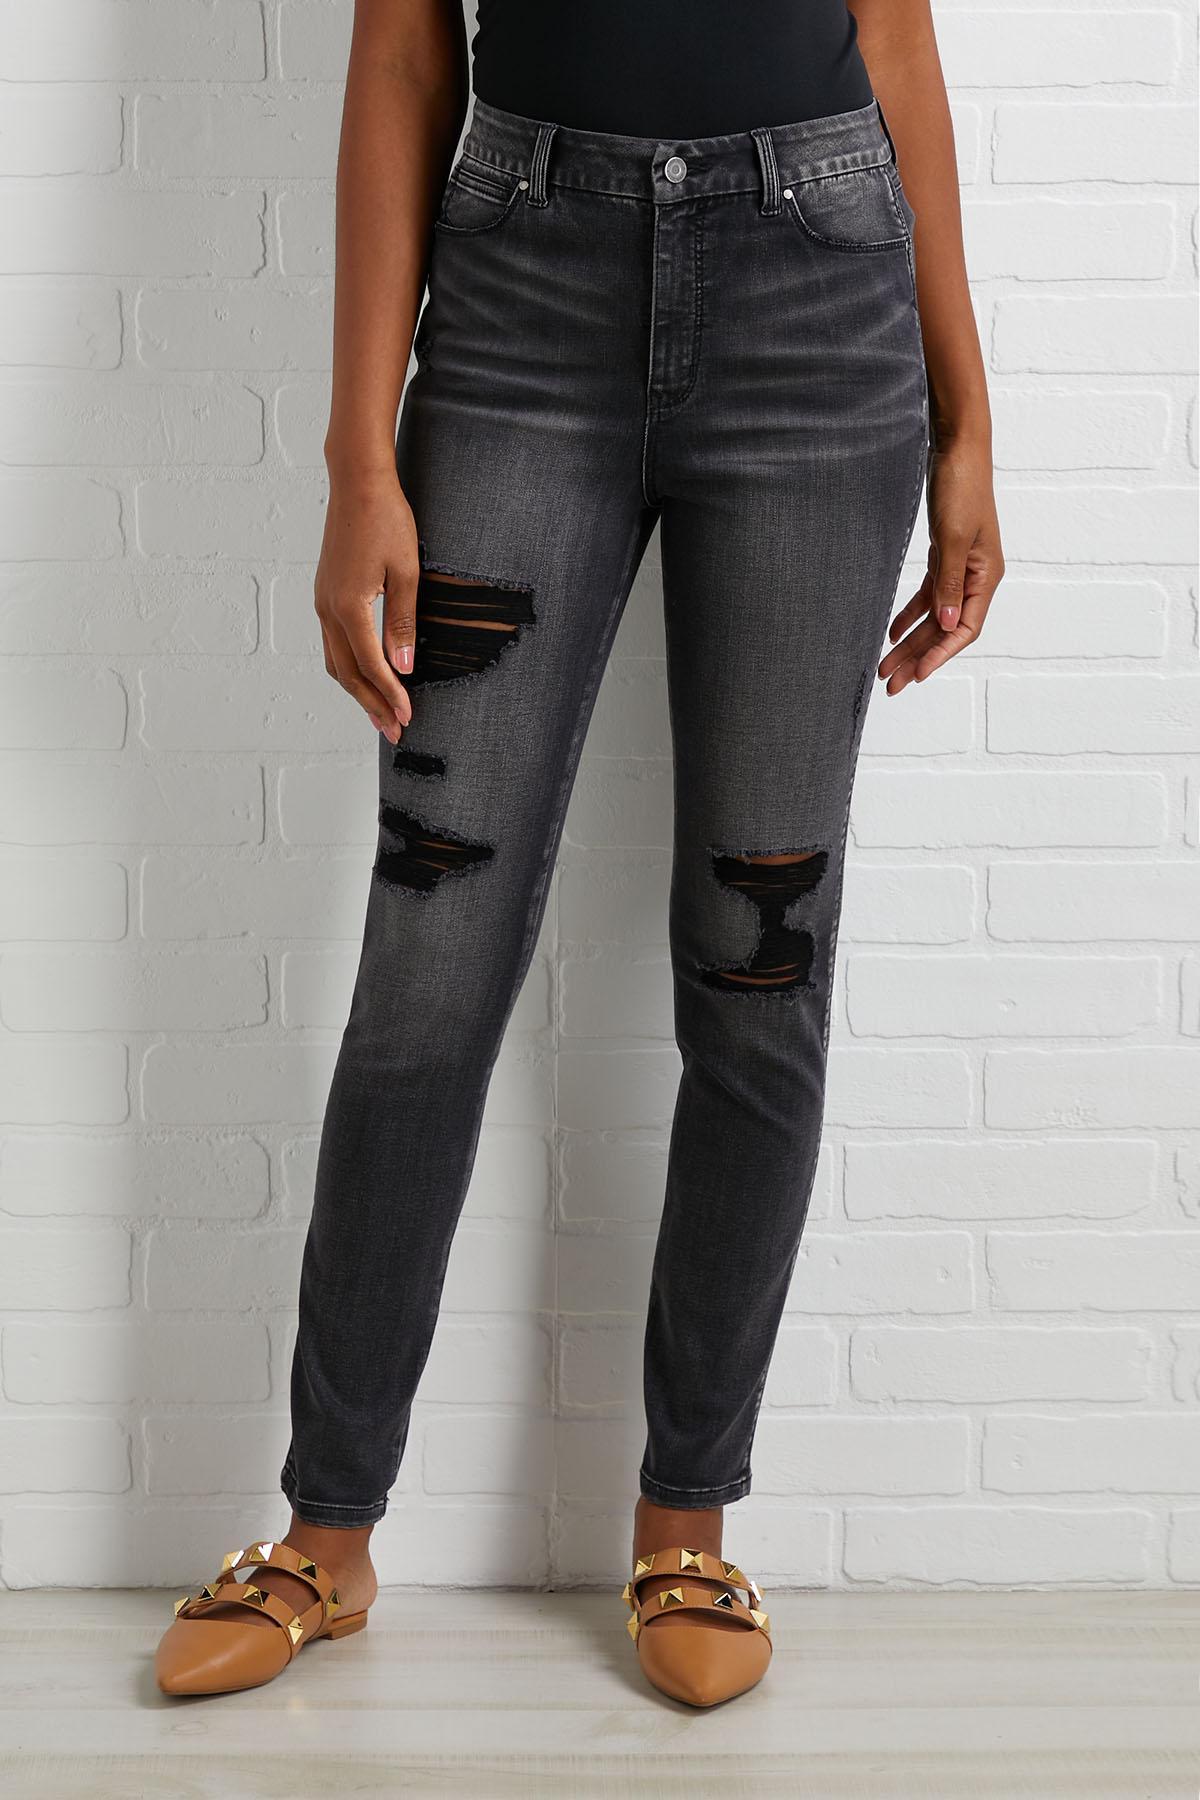 Back To Black Jeans